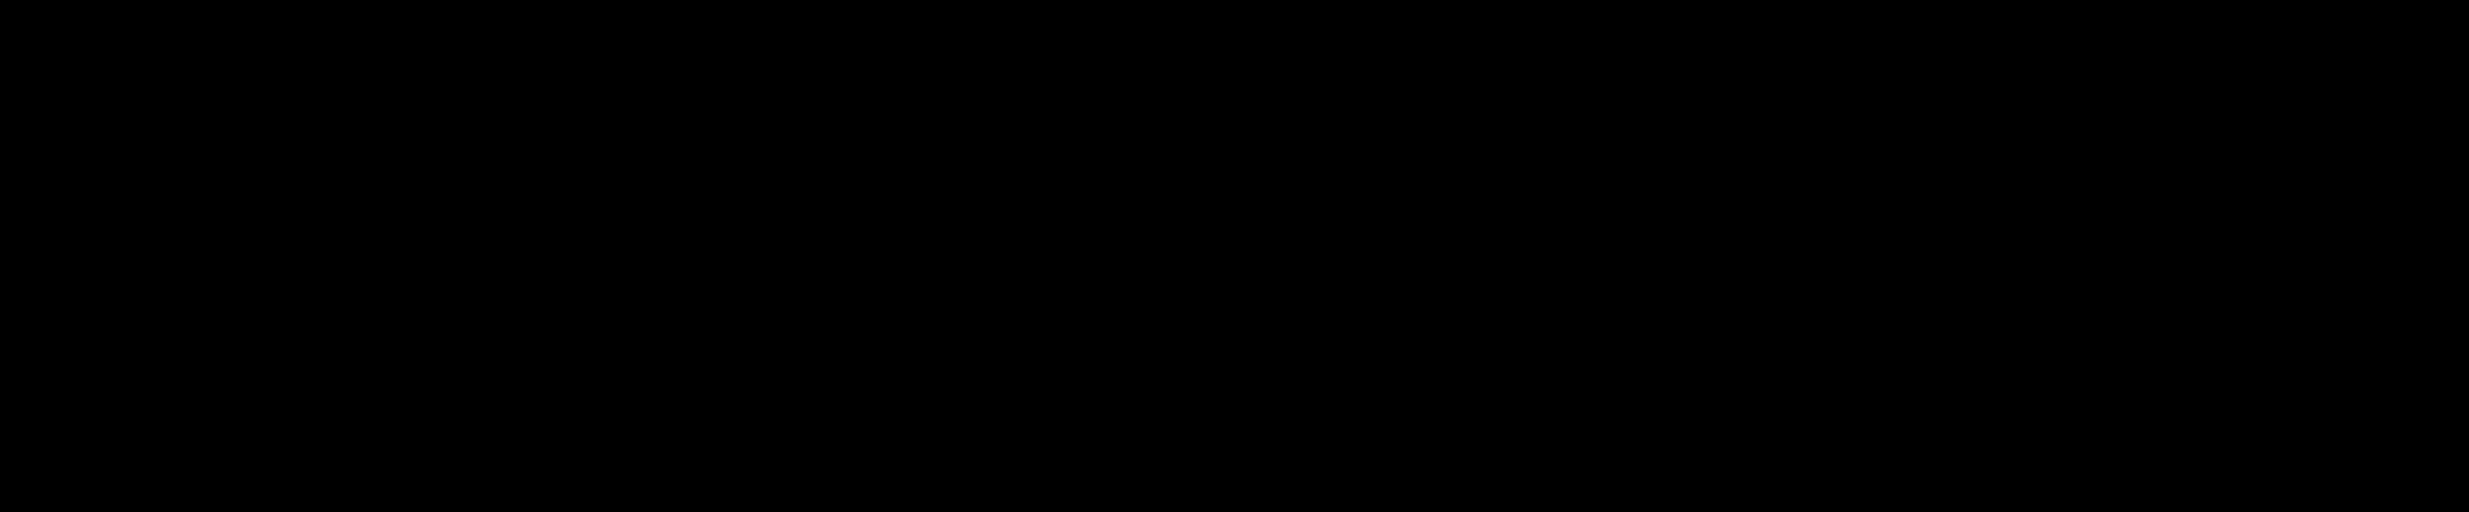 Pixel Union Design Ltd.